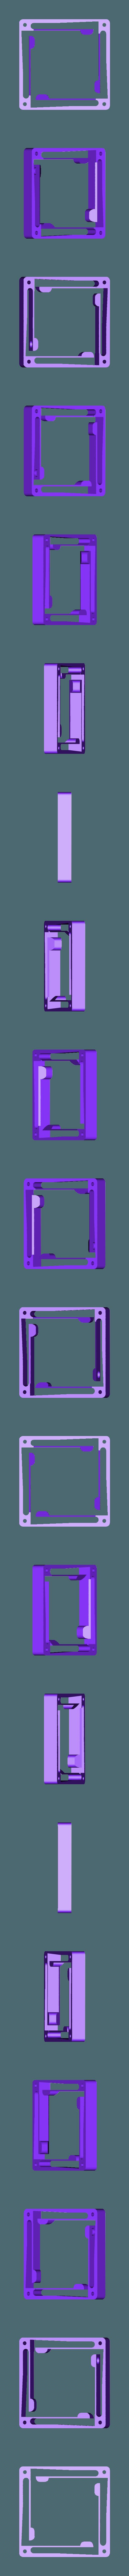 Sides.stl Download STL file Magnetic Escape Room Puzzle Box • Design to 3D print, Osprey